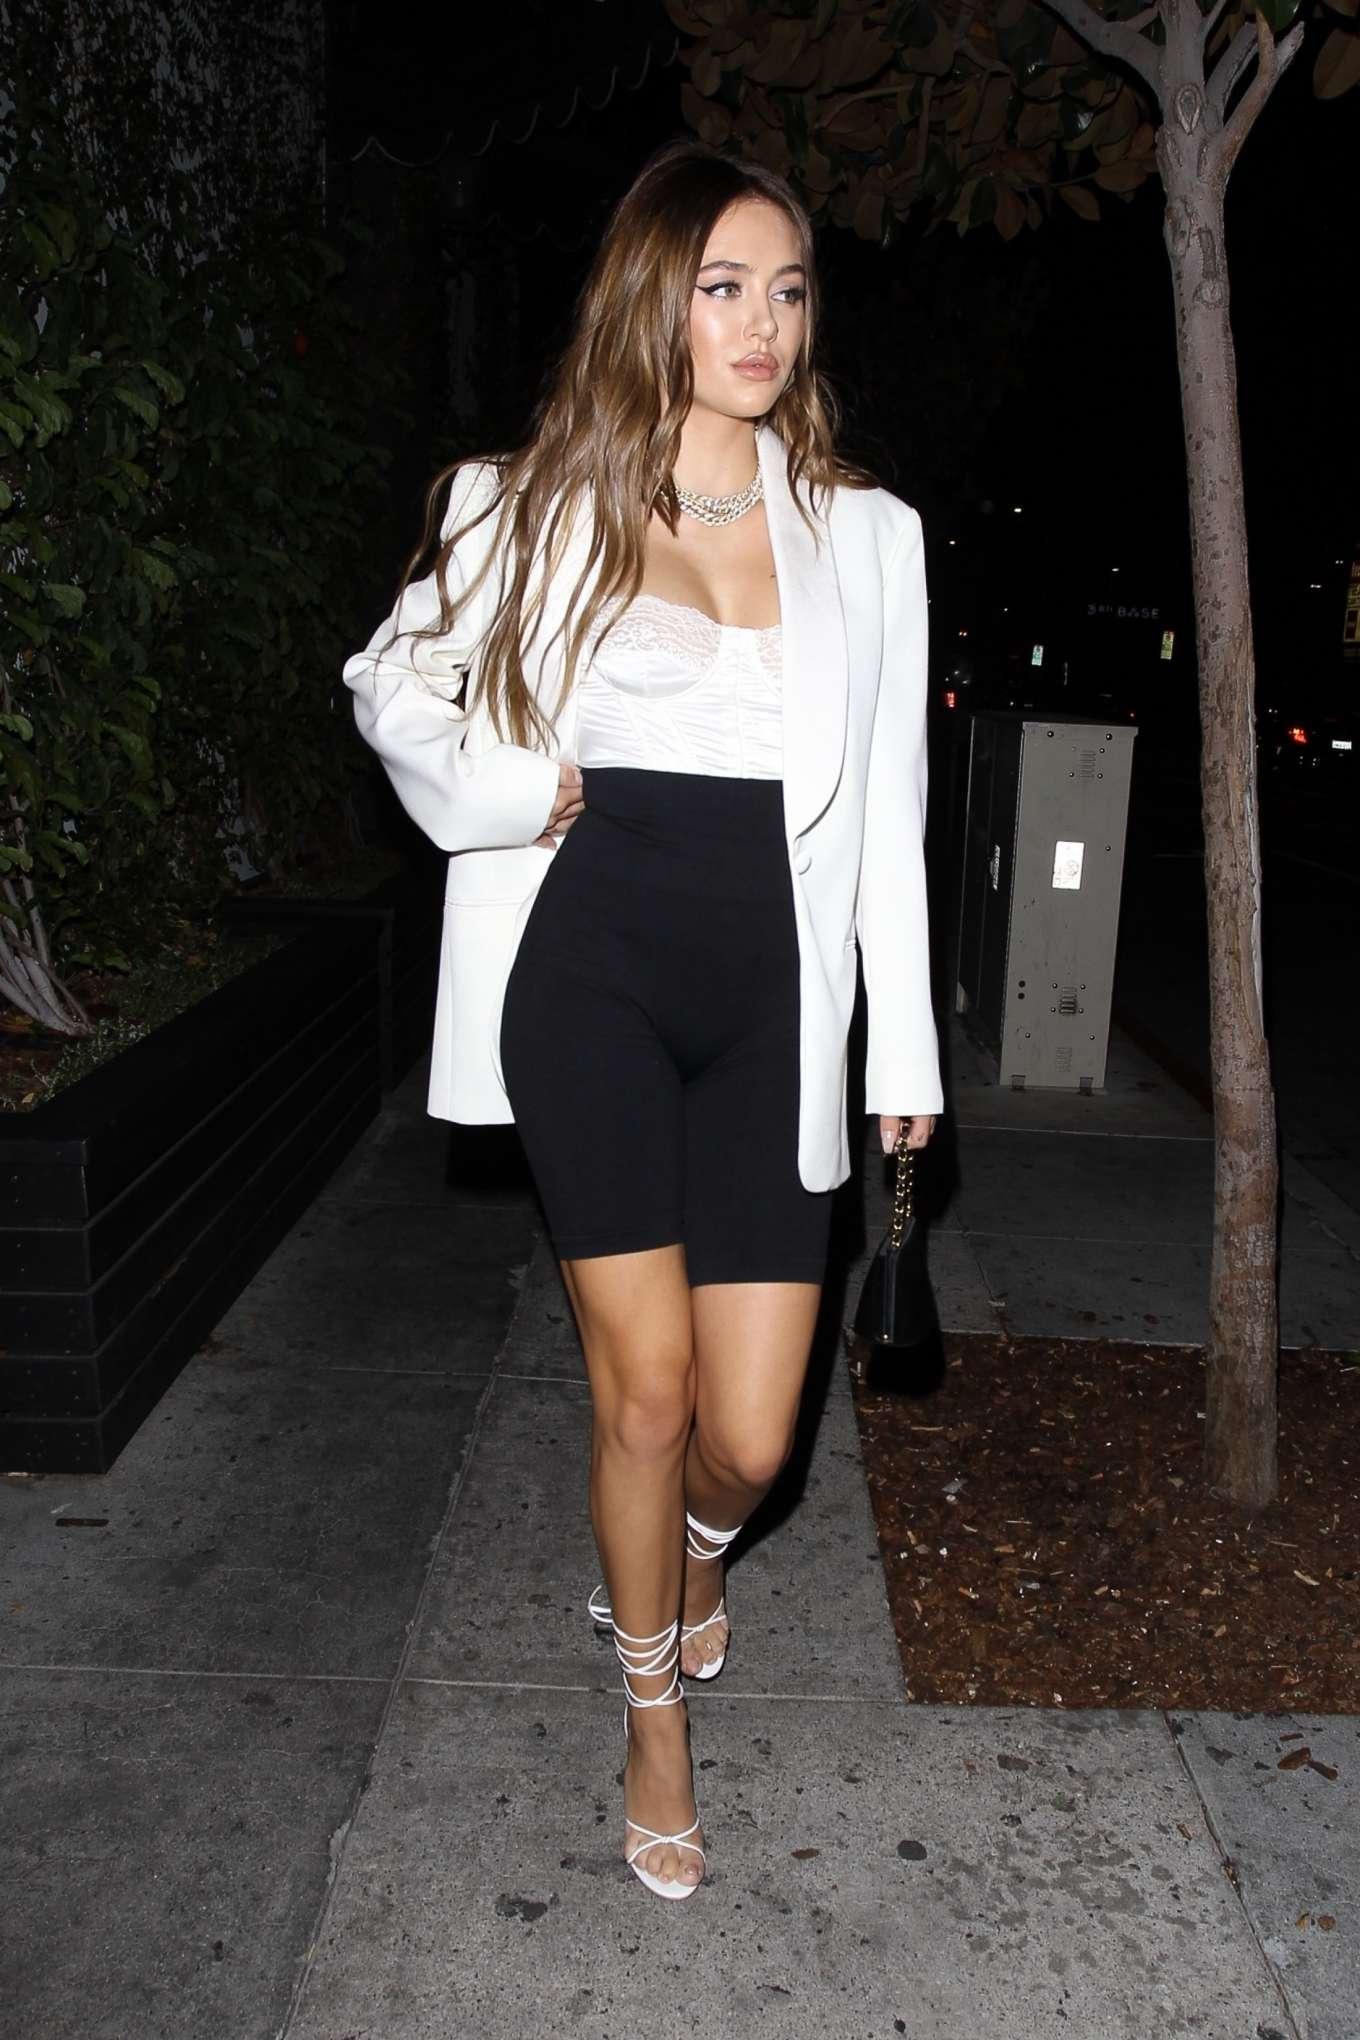 Delilah Hamlin - Arriving at Beauty & Essex in Hollywood